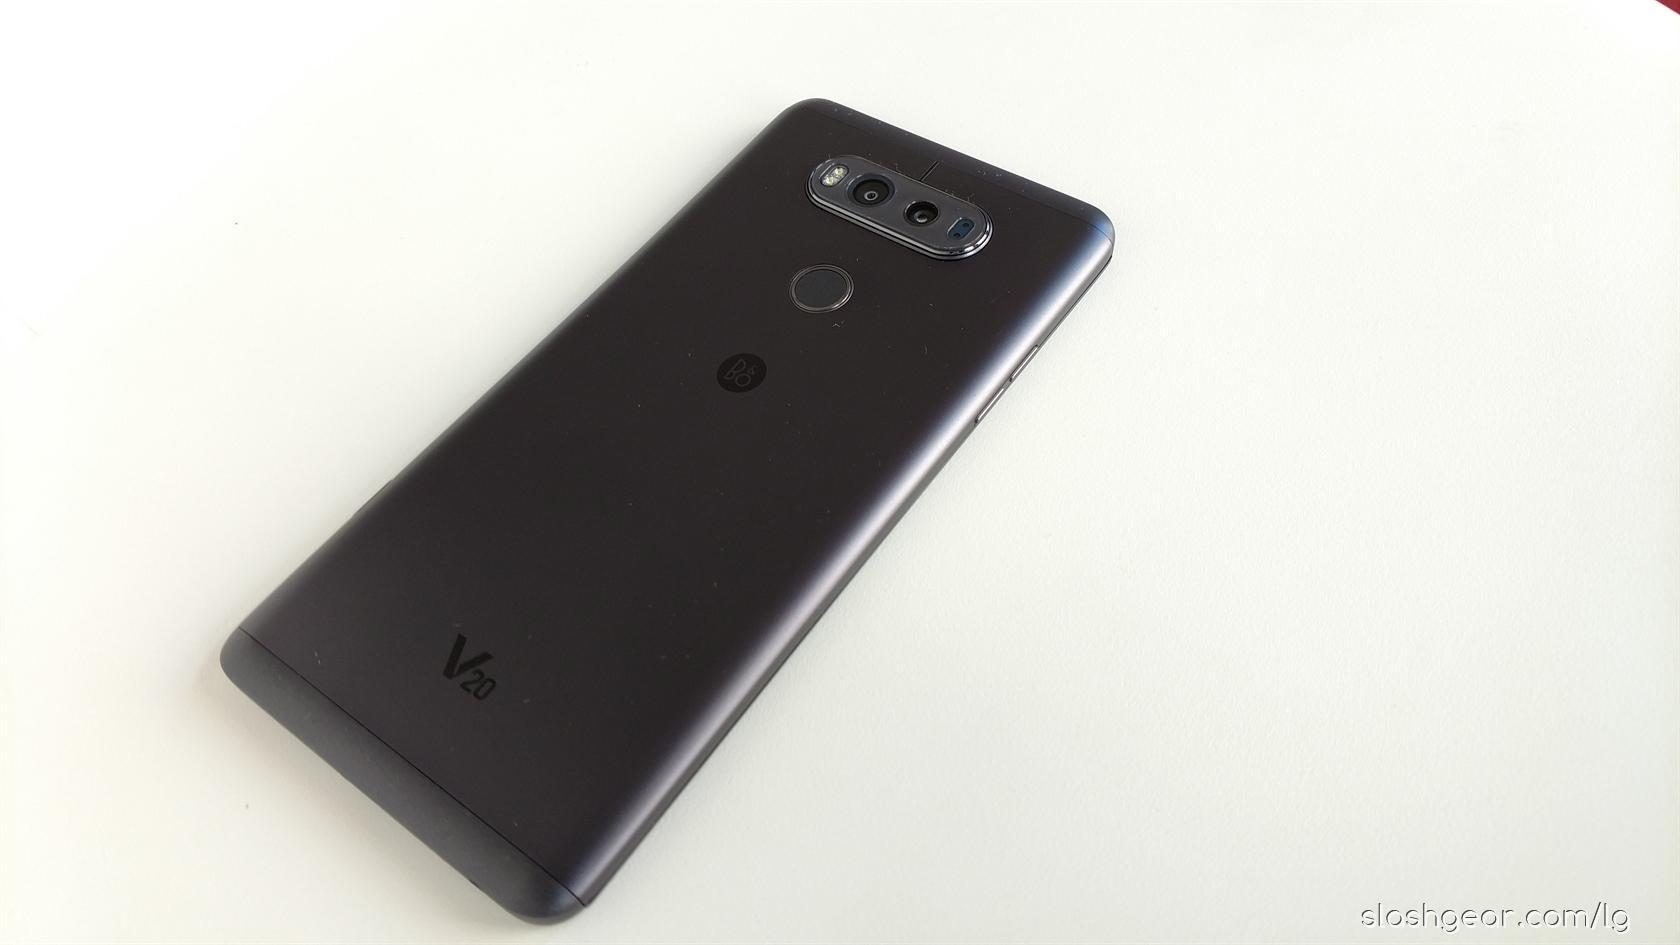 LG V20 first impressions: Refining what works - SlashGear